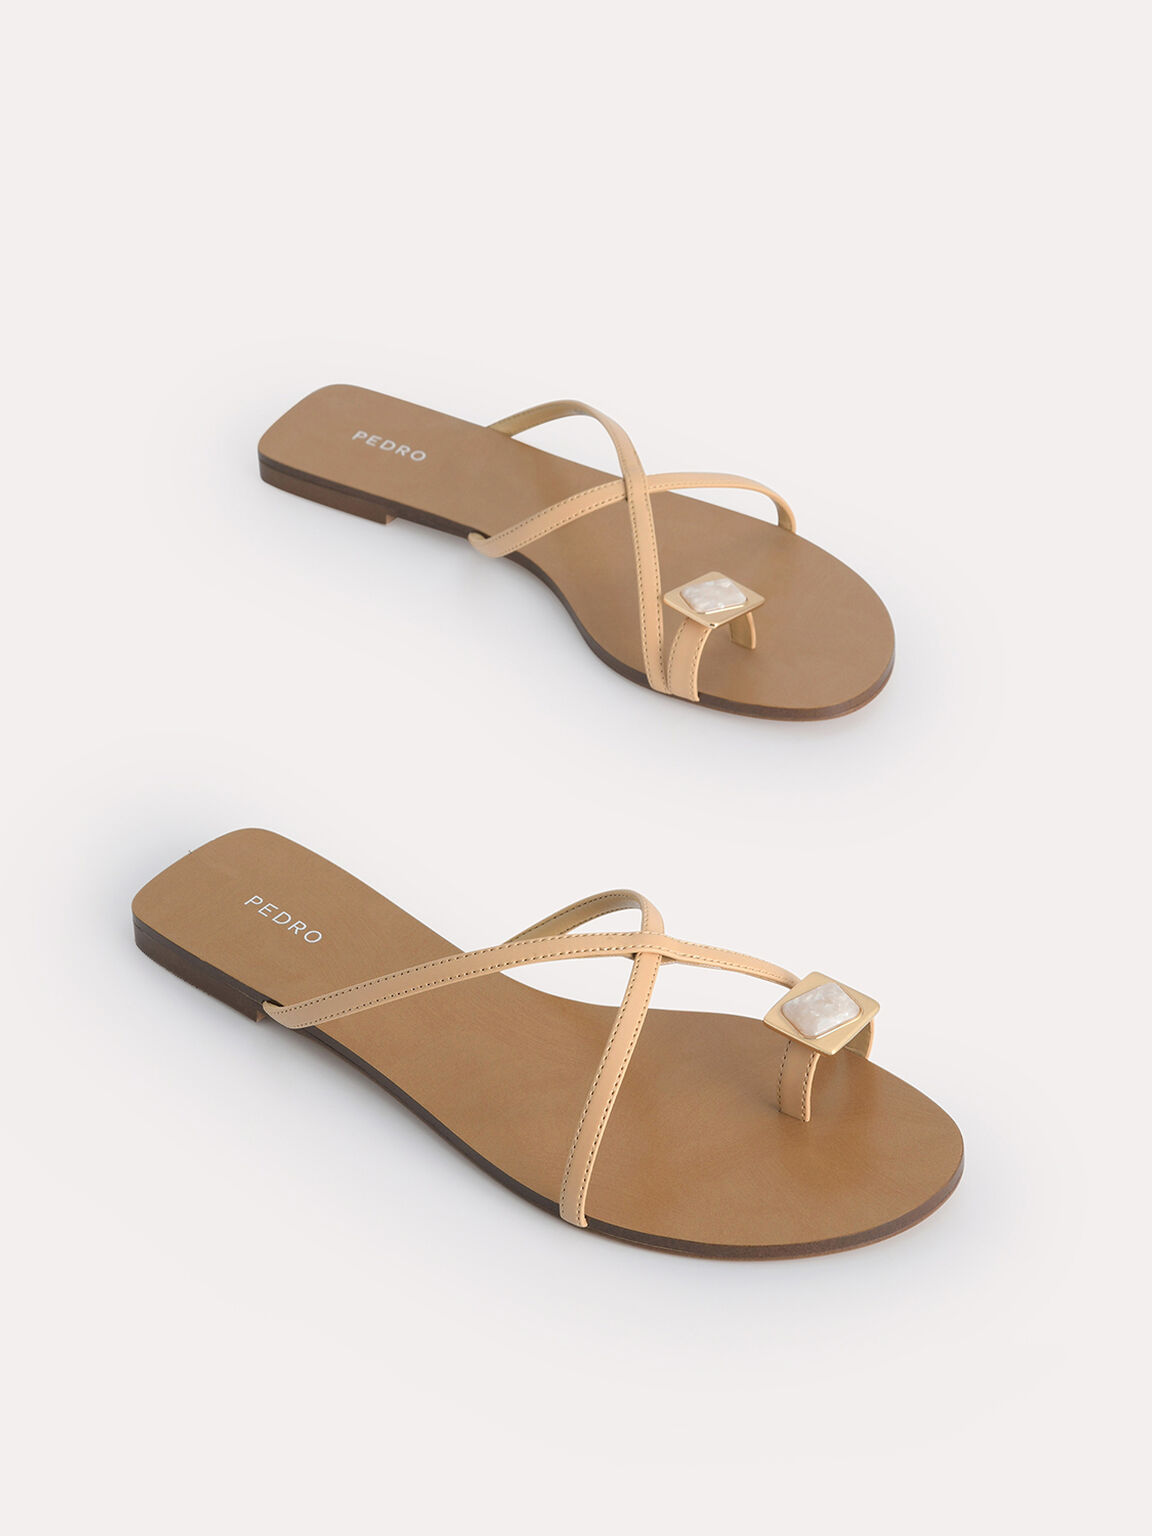 Marbled Toe Loop Sandals, Sand, hi-res